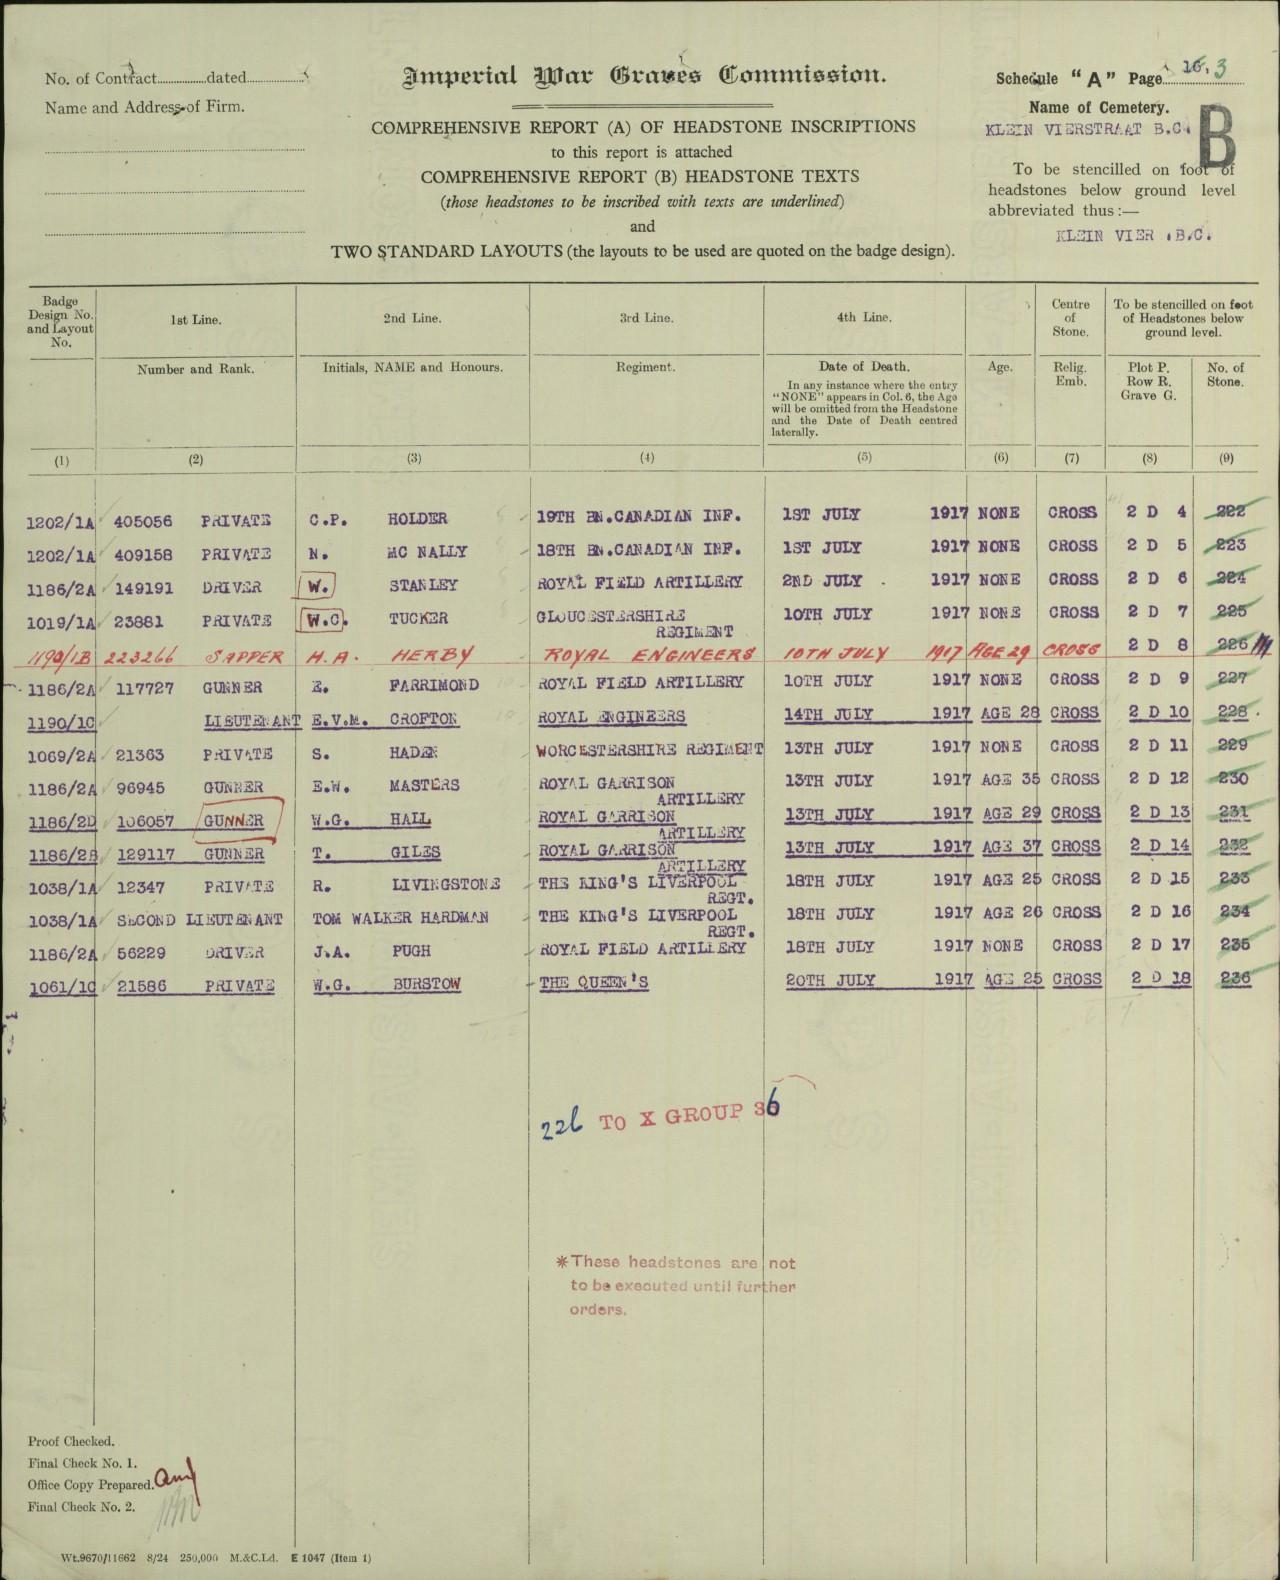 doc1851128